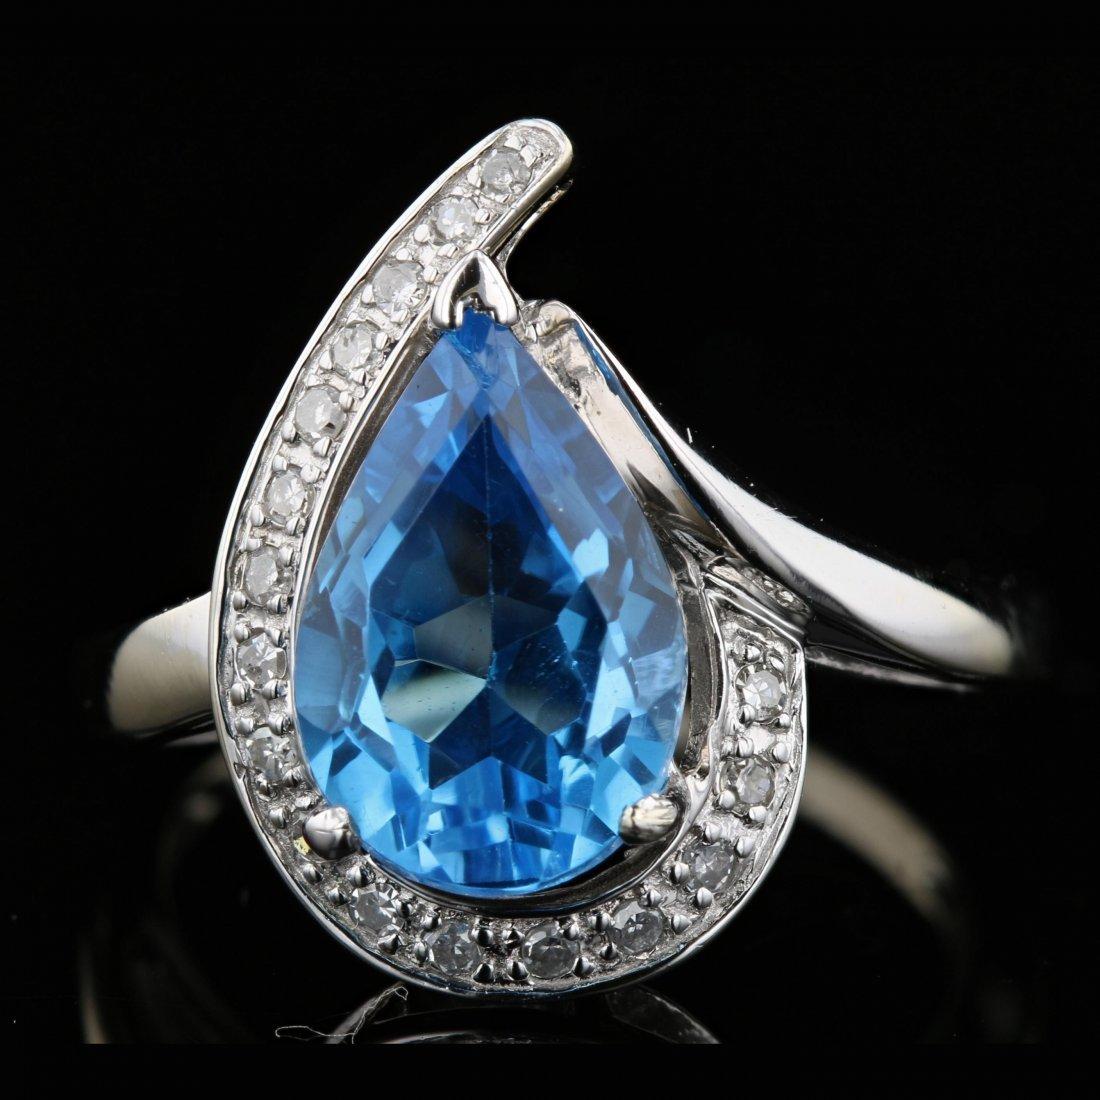 14k White Gold 3.90CT Topaz & 0.18CT Diamond Ring